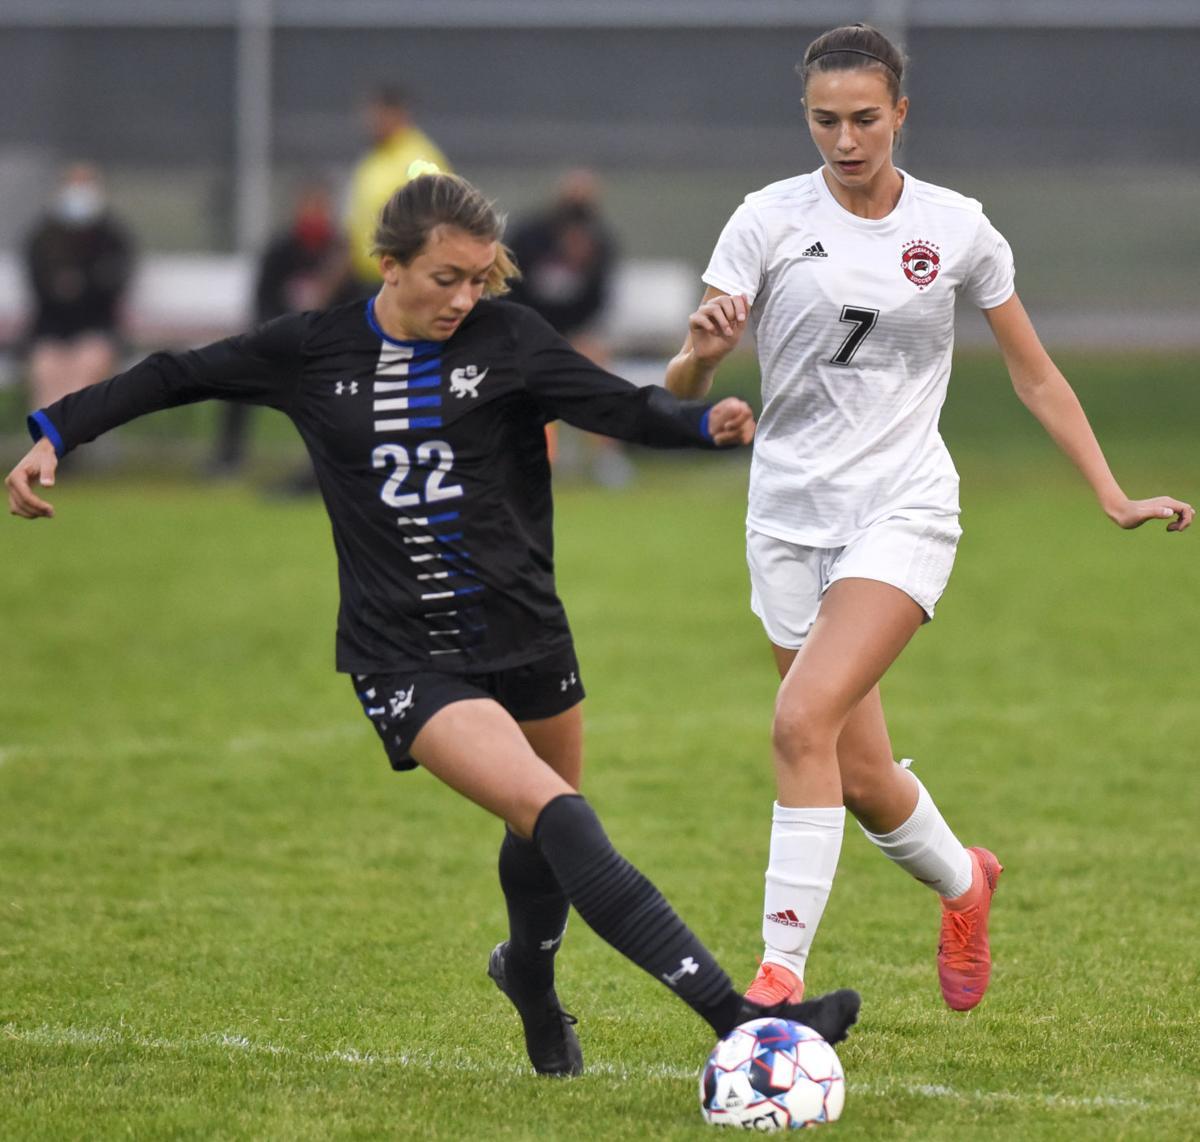 Girls Soccer, Hawks v. Raptors (copy)